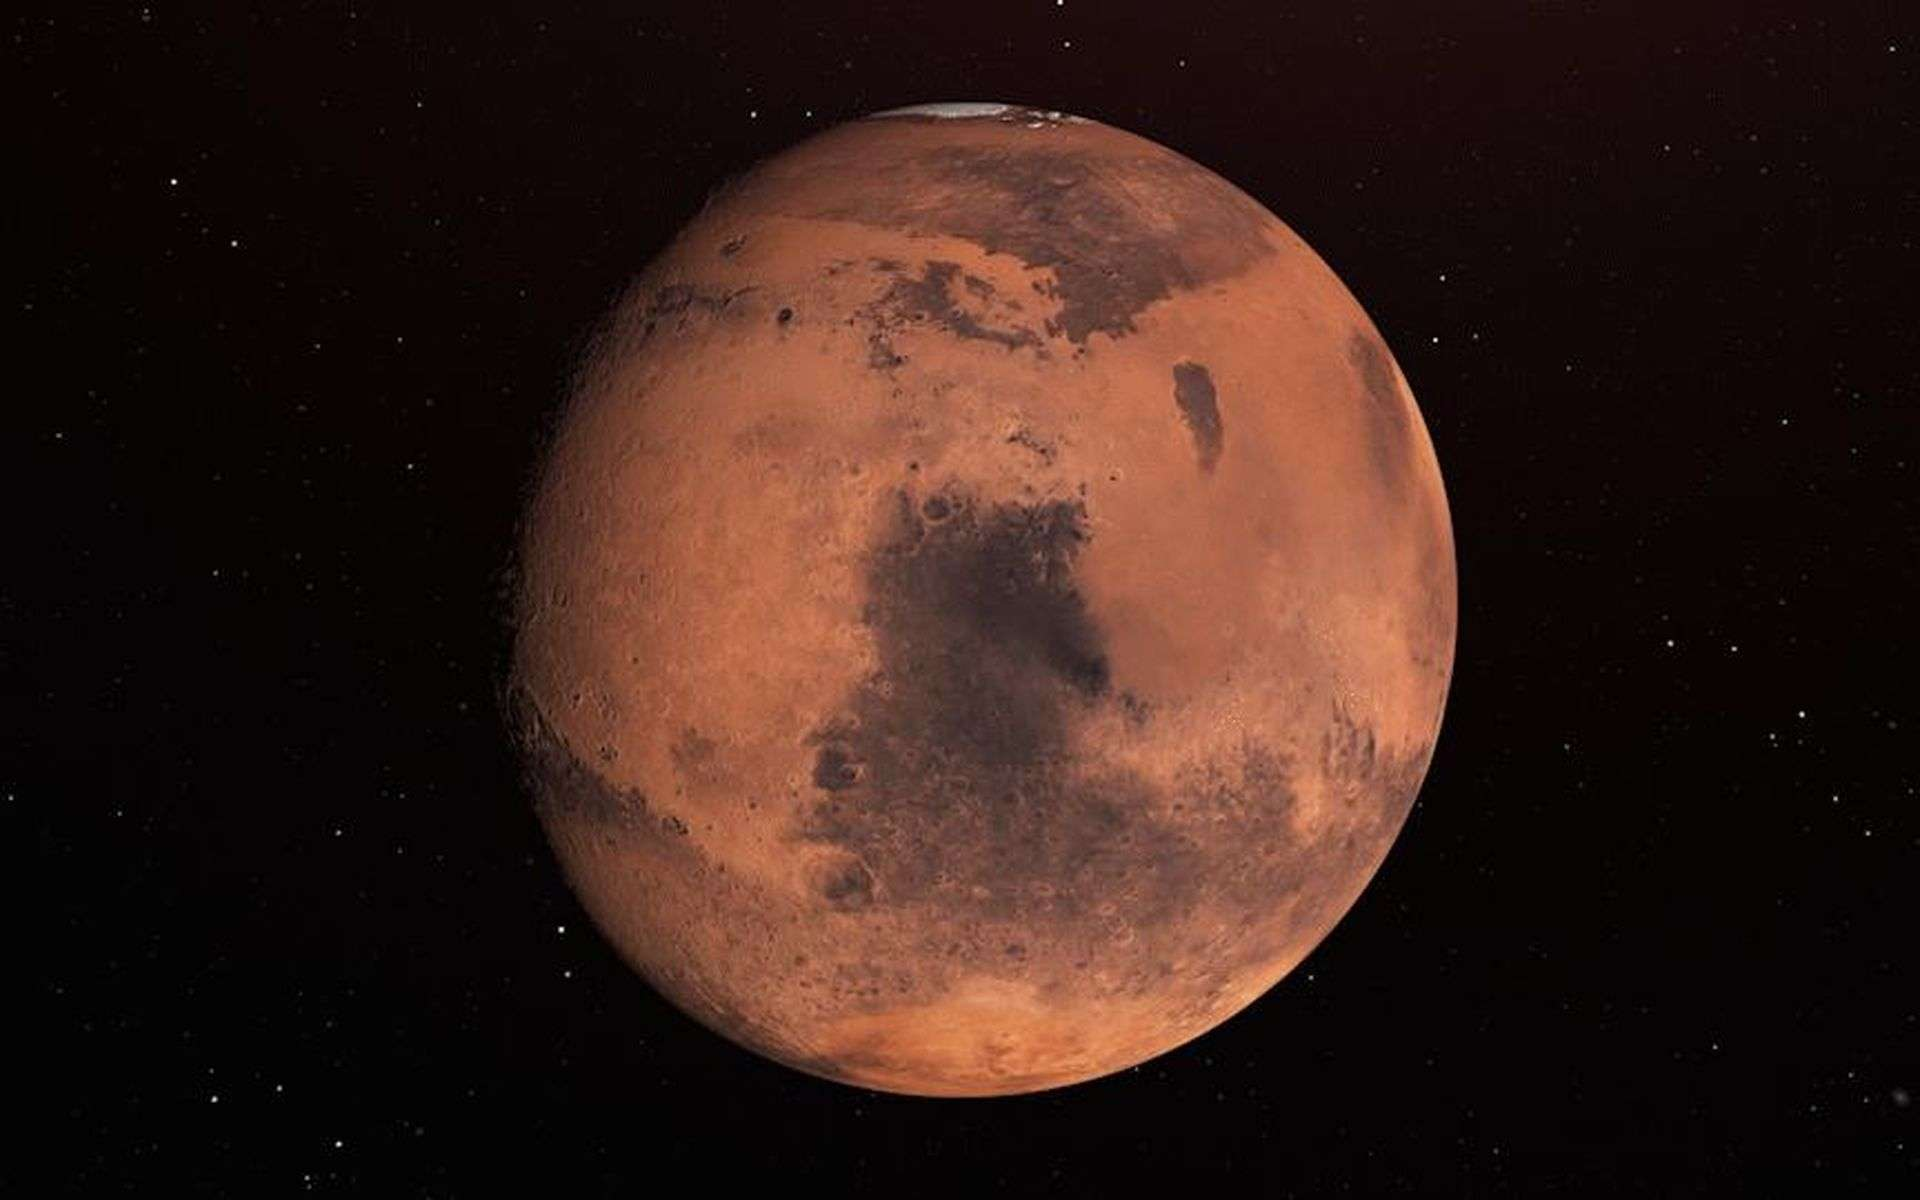 Image de Mars prise par MRO. © Nasa, JPL-Caltech